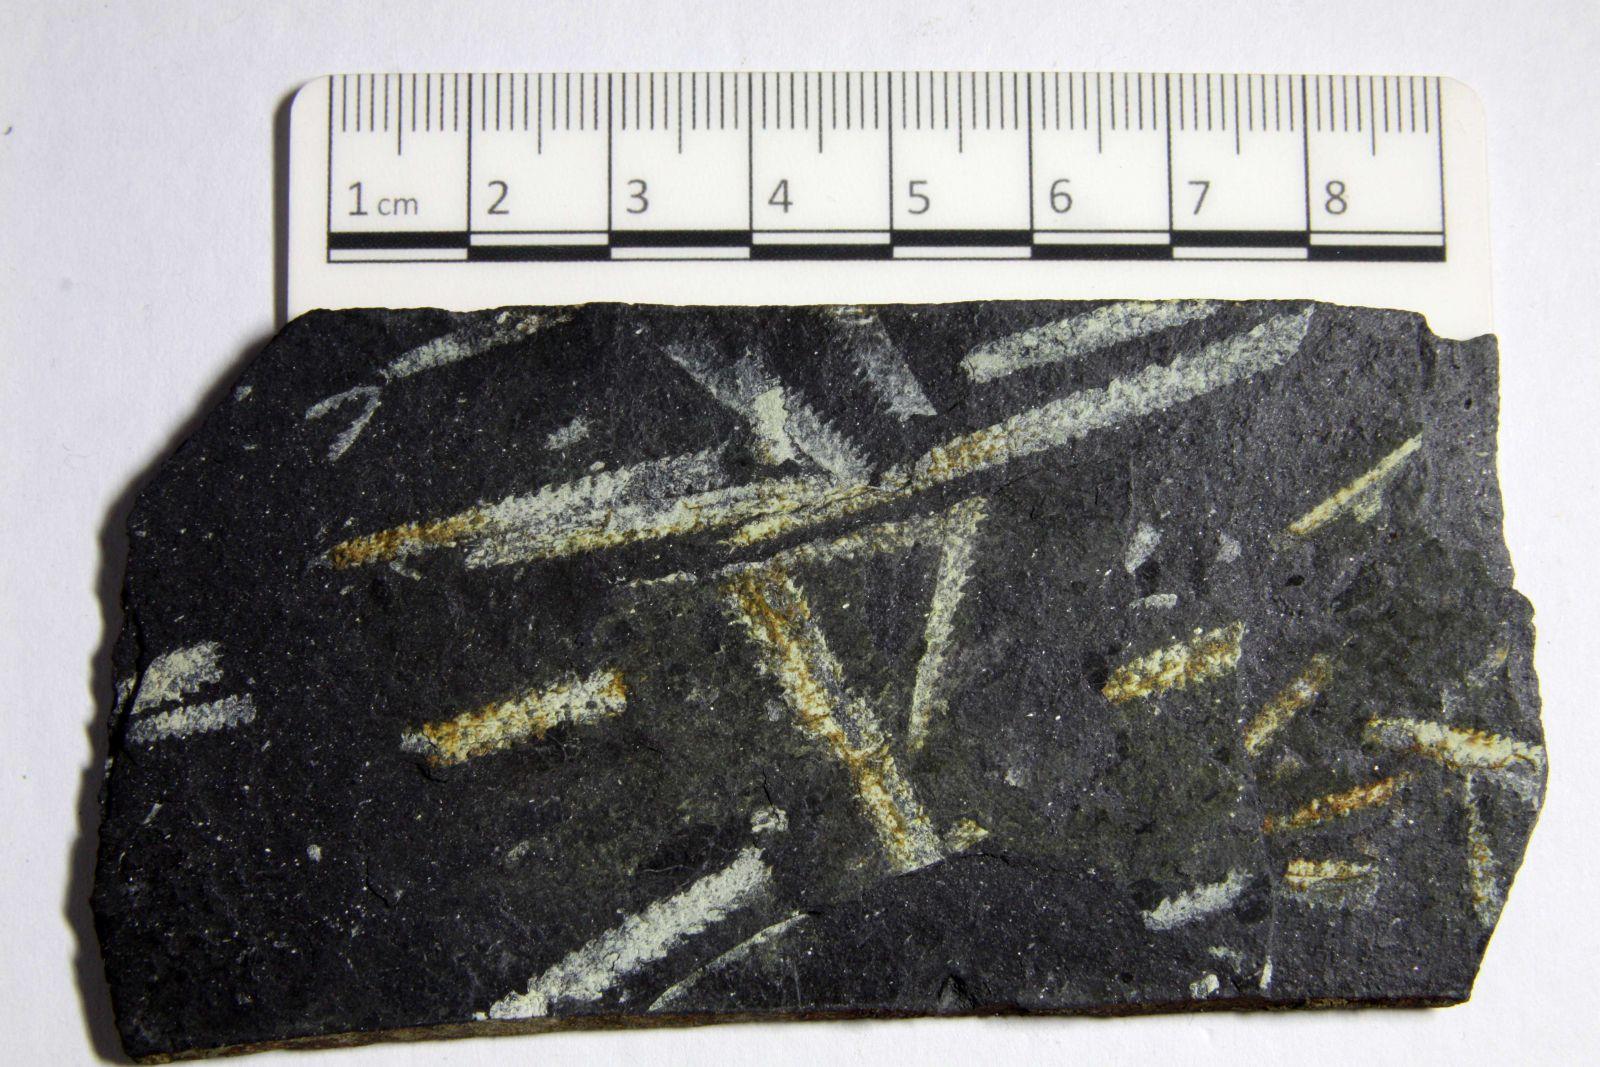 Didymograptus marchioness graptolite